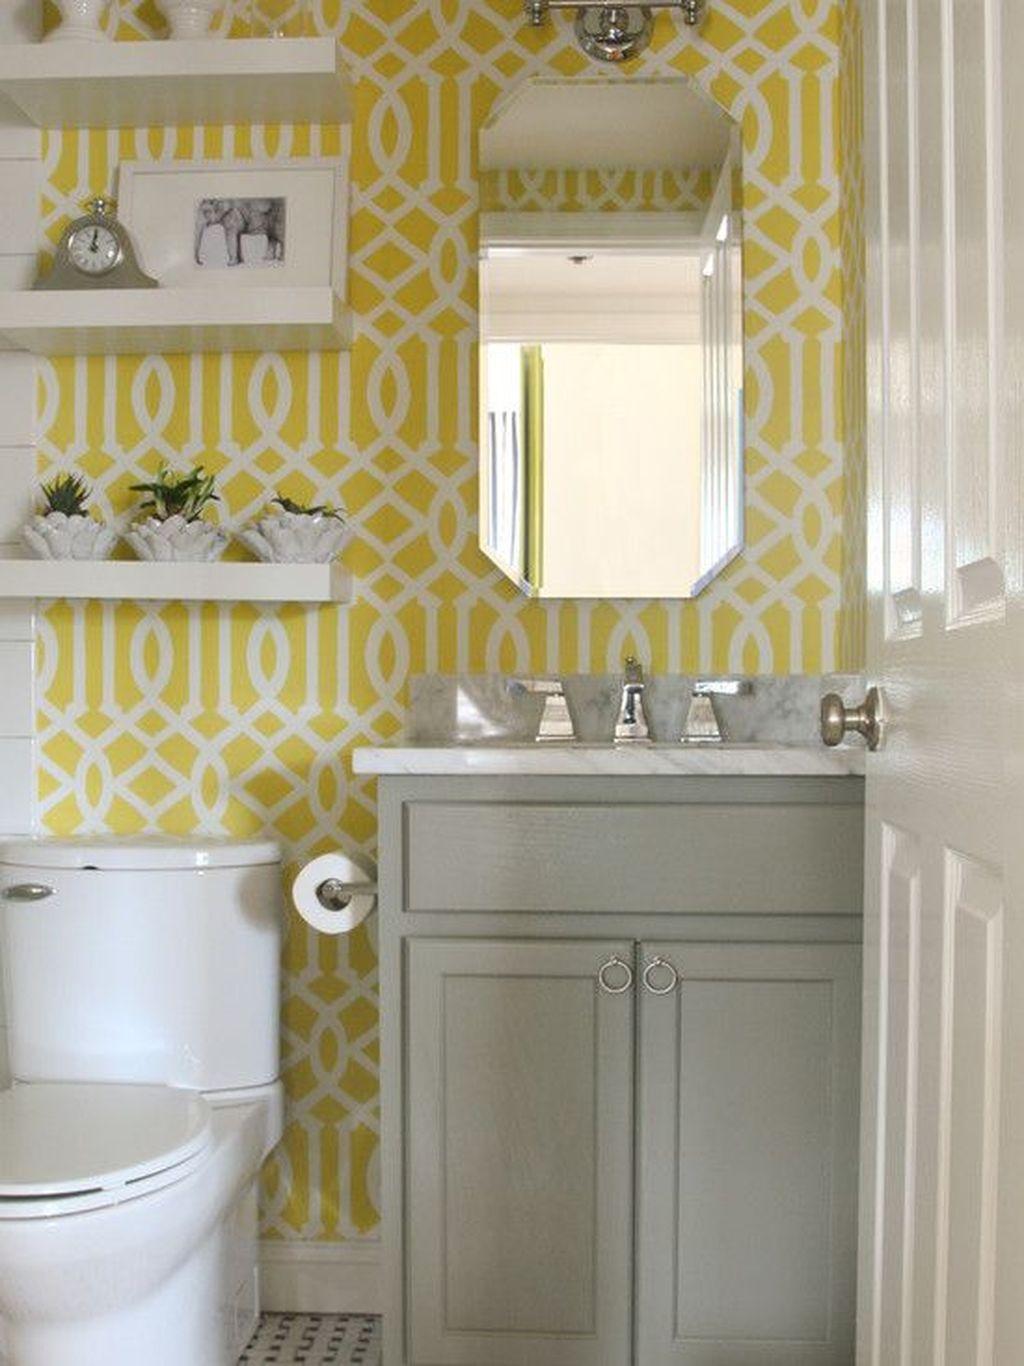 Creative Sunny Yellow Bathroom Decor For Summer 19